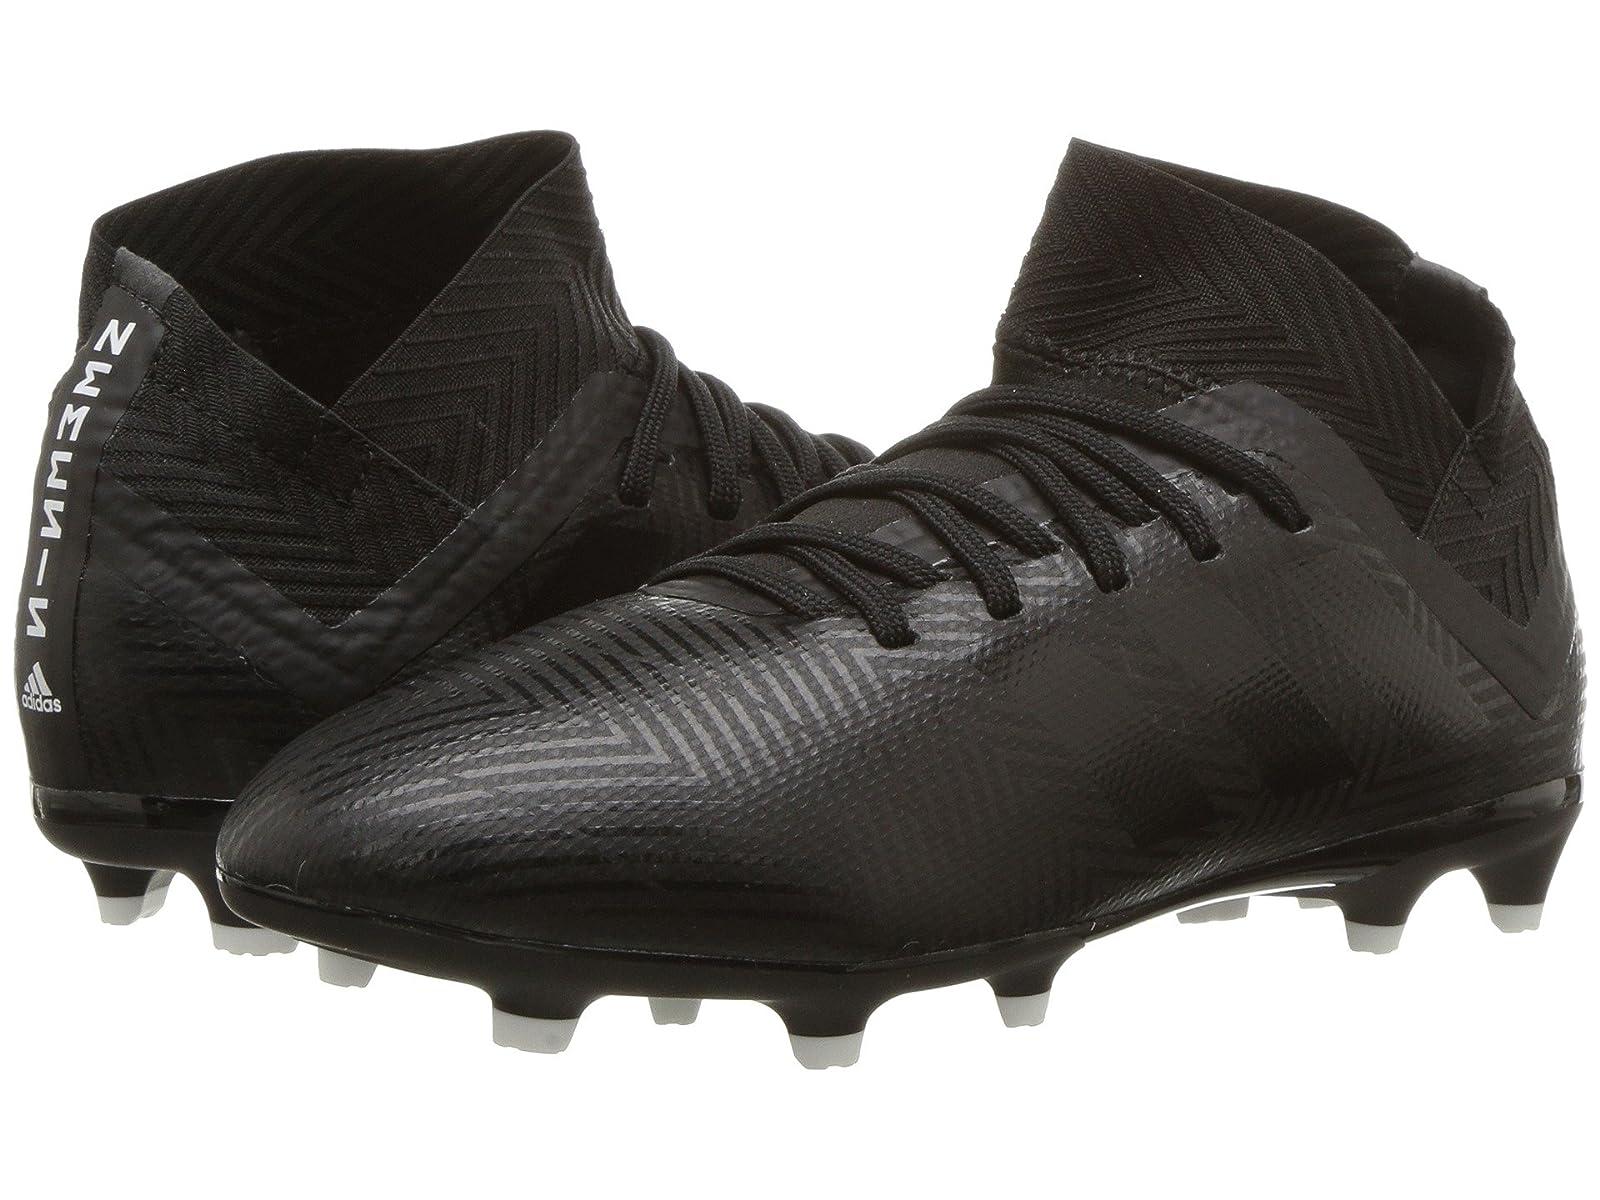 adidas Kids Nemeziz 18.3 FG Soccer (Little Kid/Big Kid)Atmospheric grades have affordable shoes